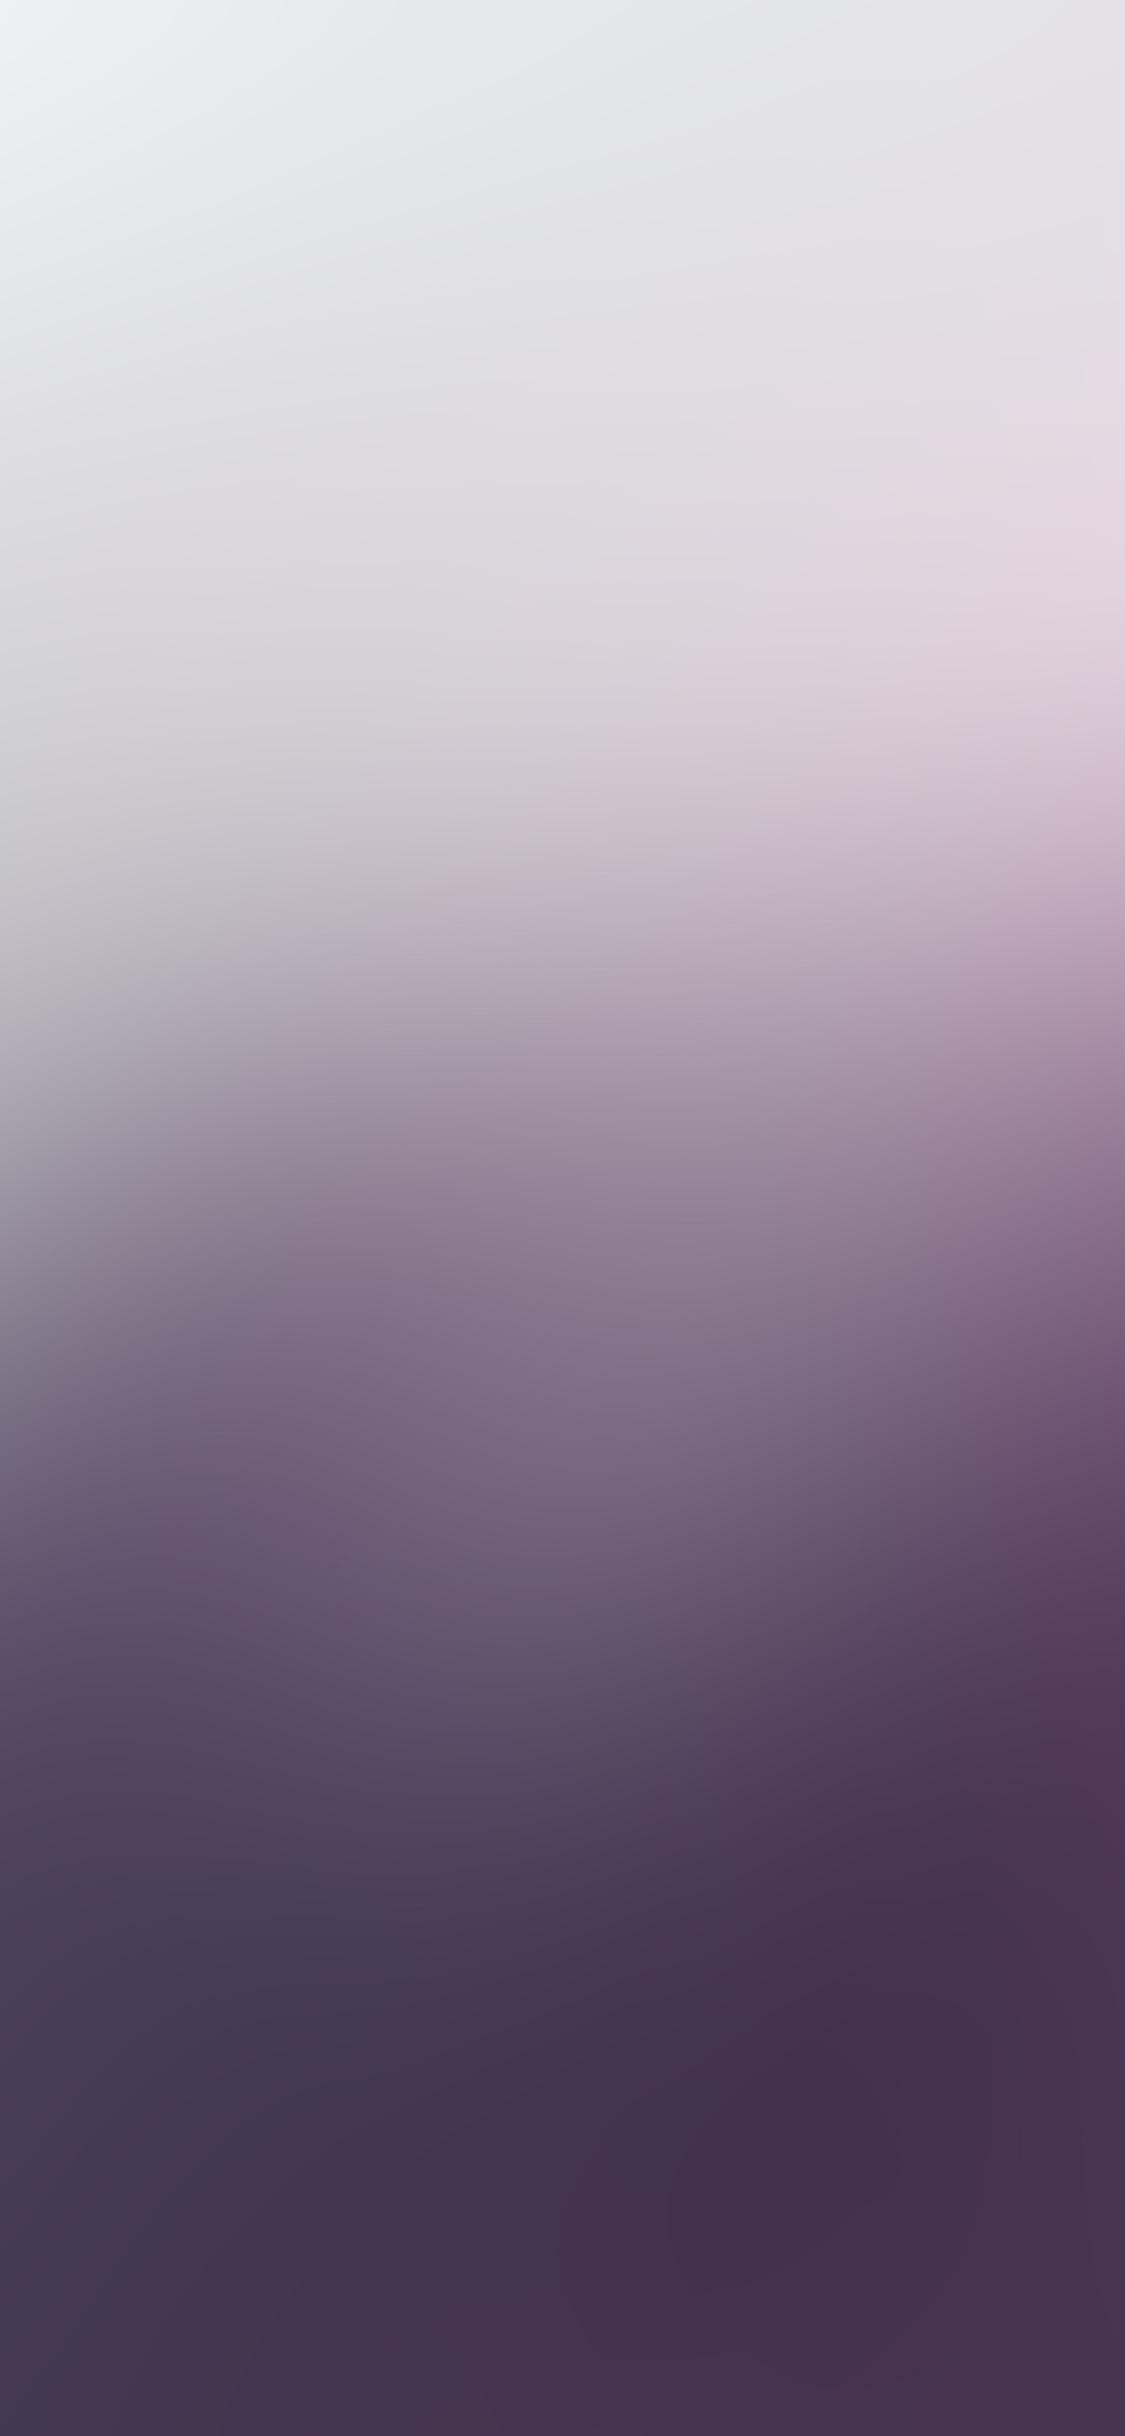 iPhonexpapers.com-Apple-iPhone-wallpaper-sm81-purple-blue-blur-gradation